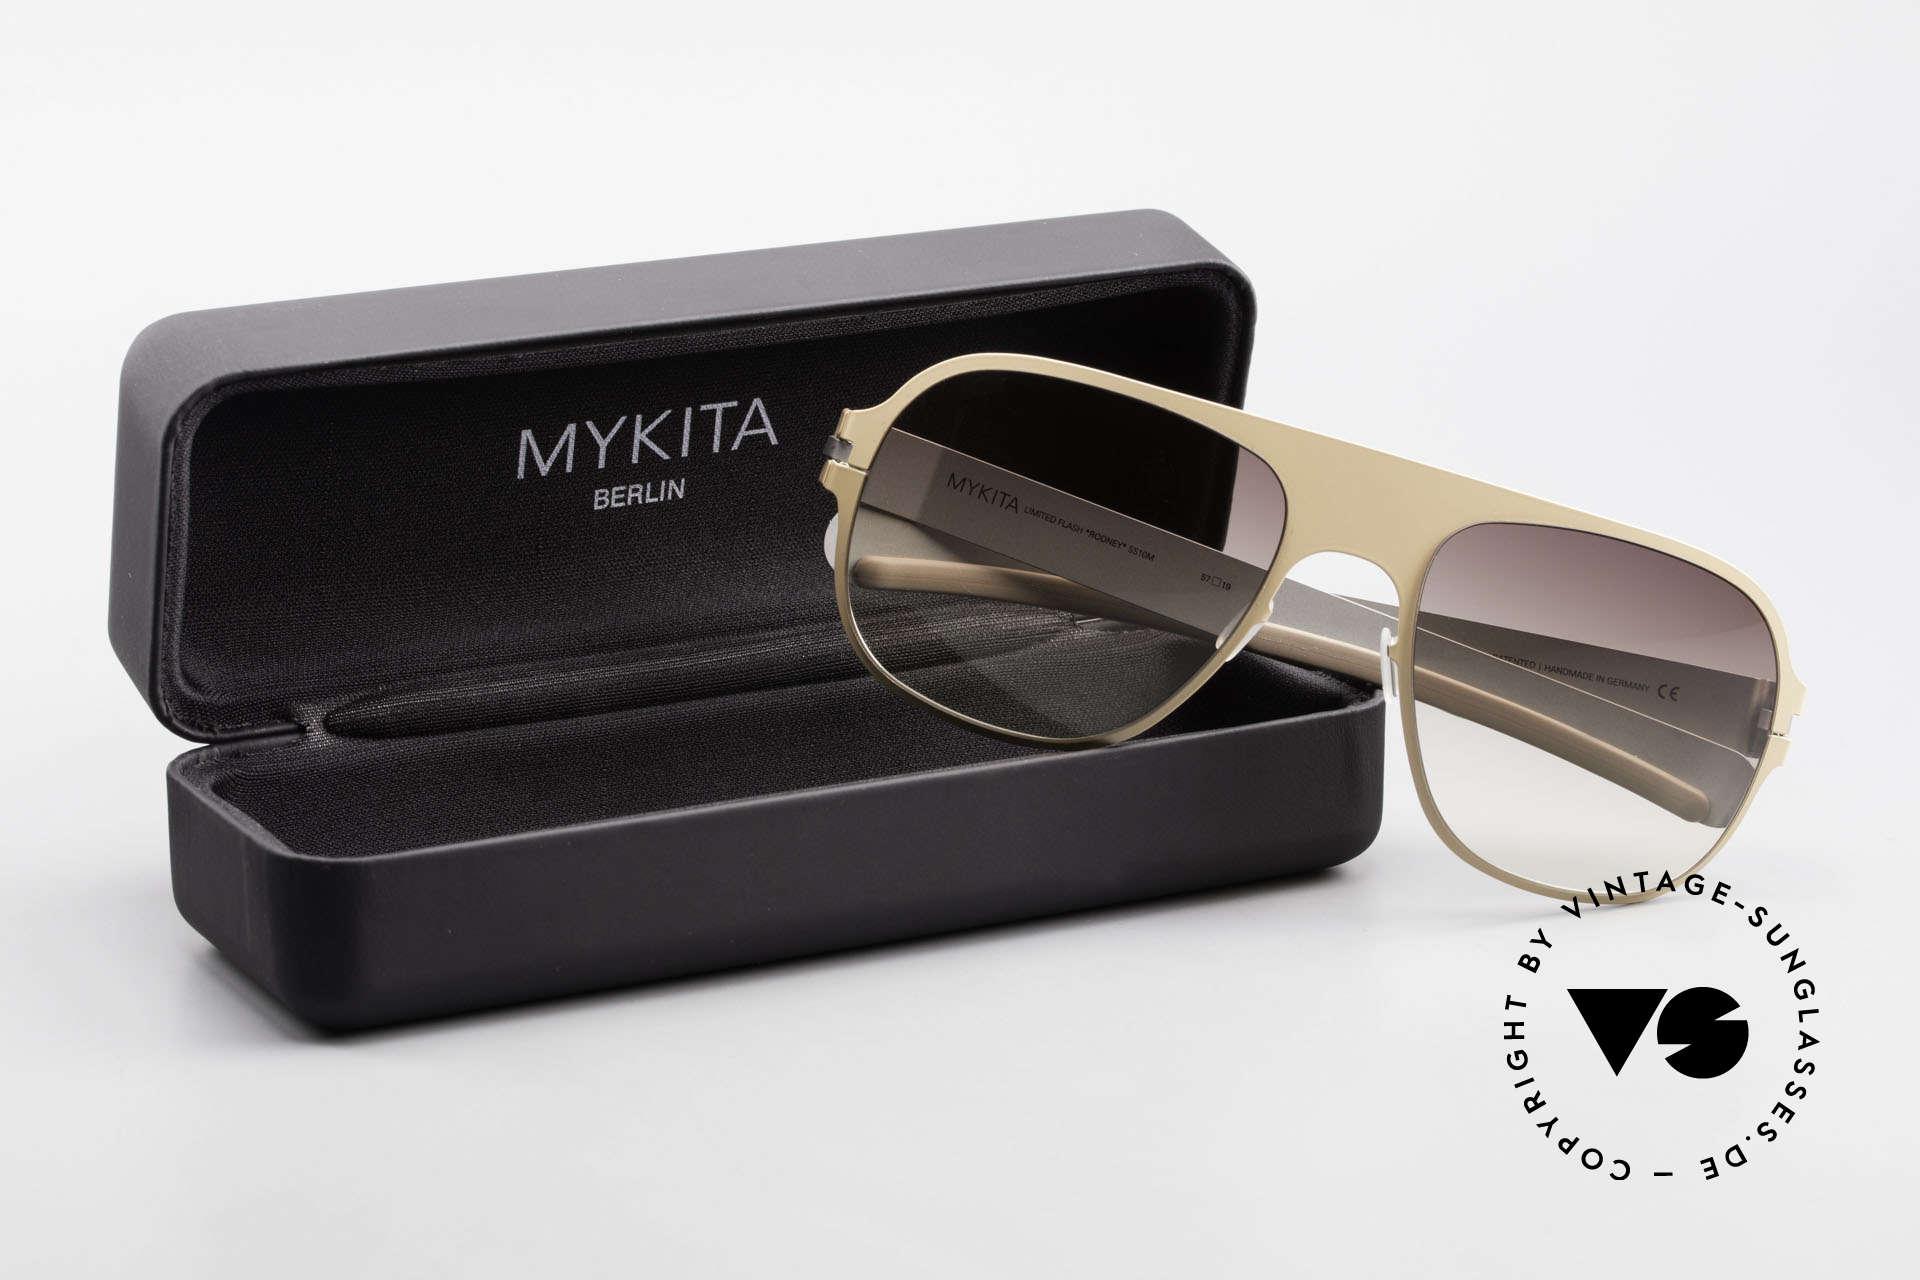 Mykita Rodney Designer Sunglasses Limited, Size: medium, Made for Men